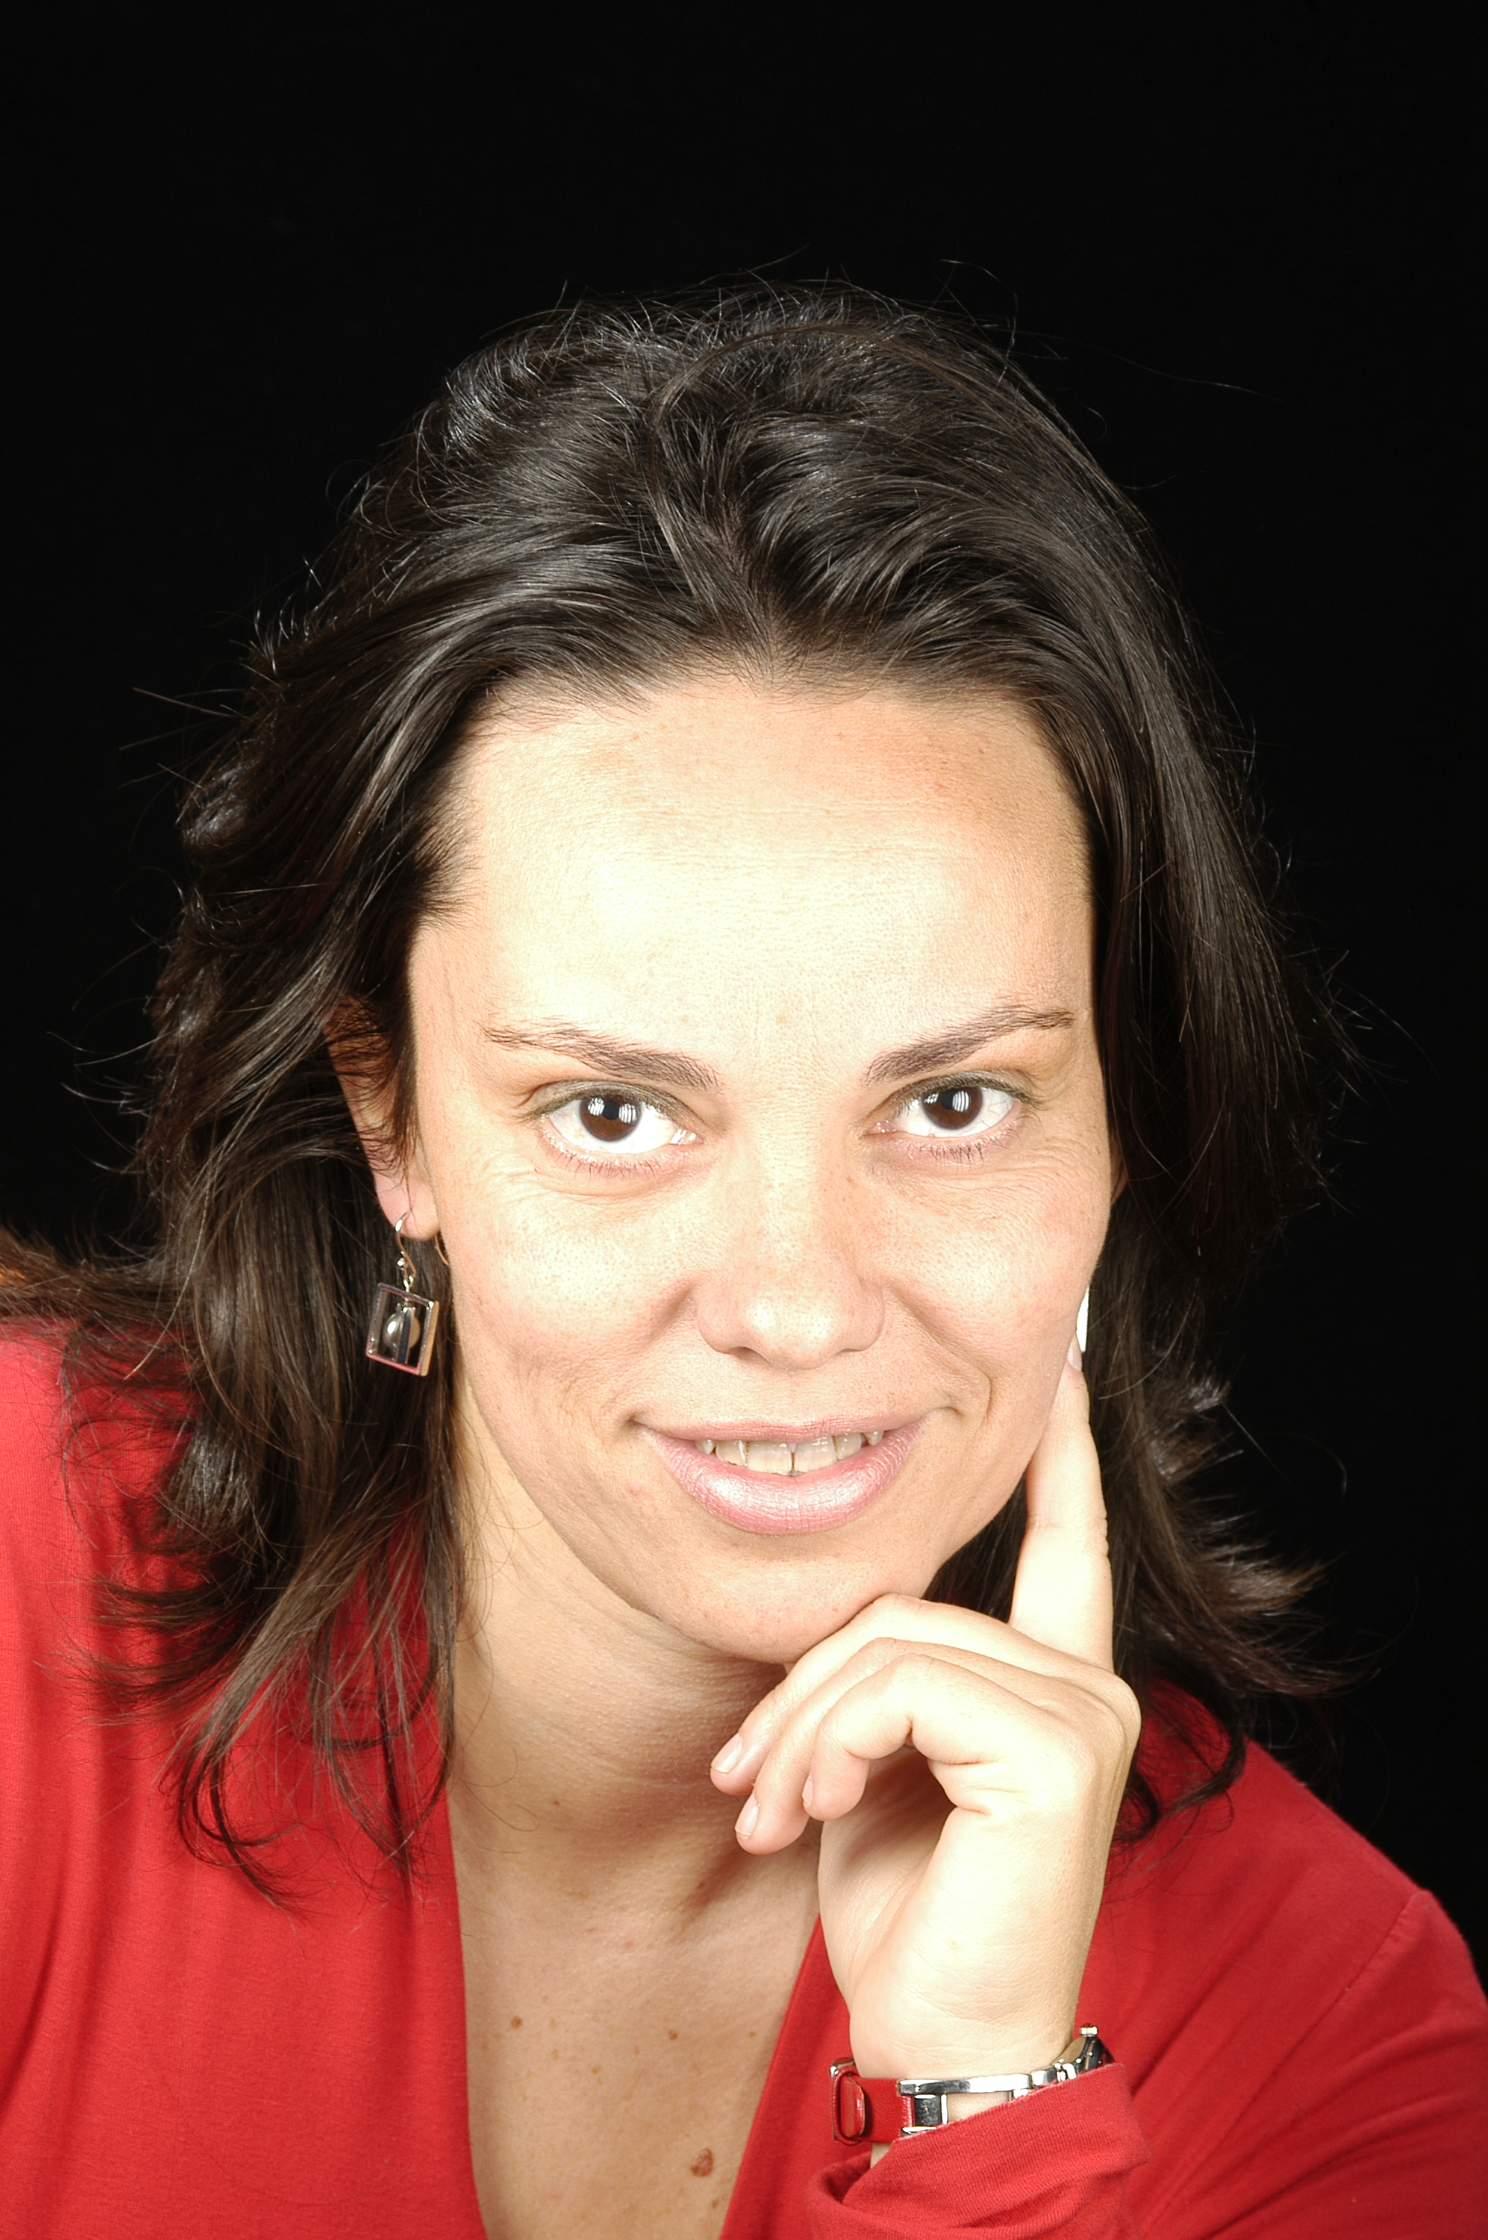 Sra. Marta Ribó López